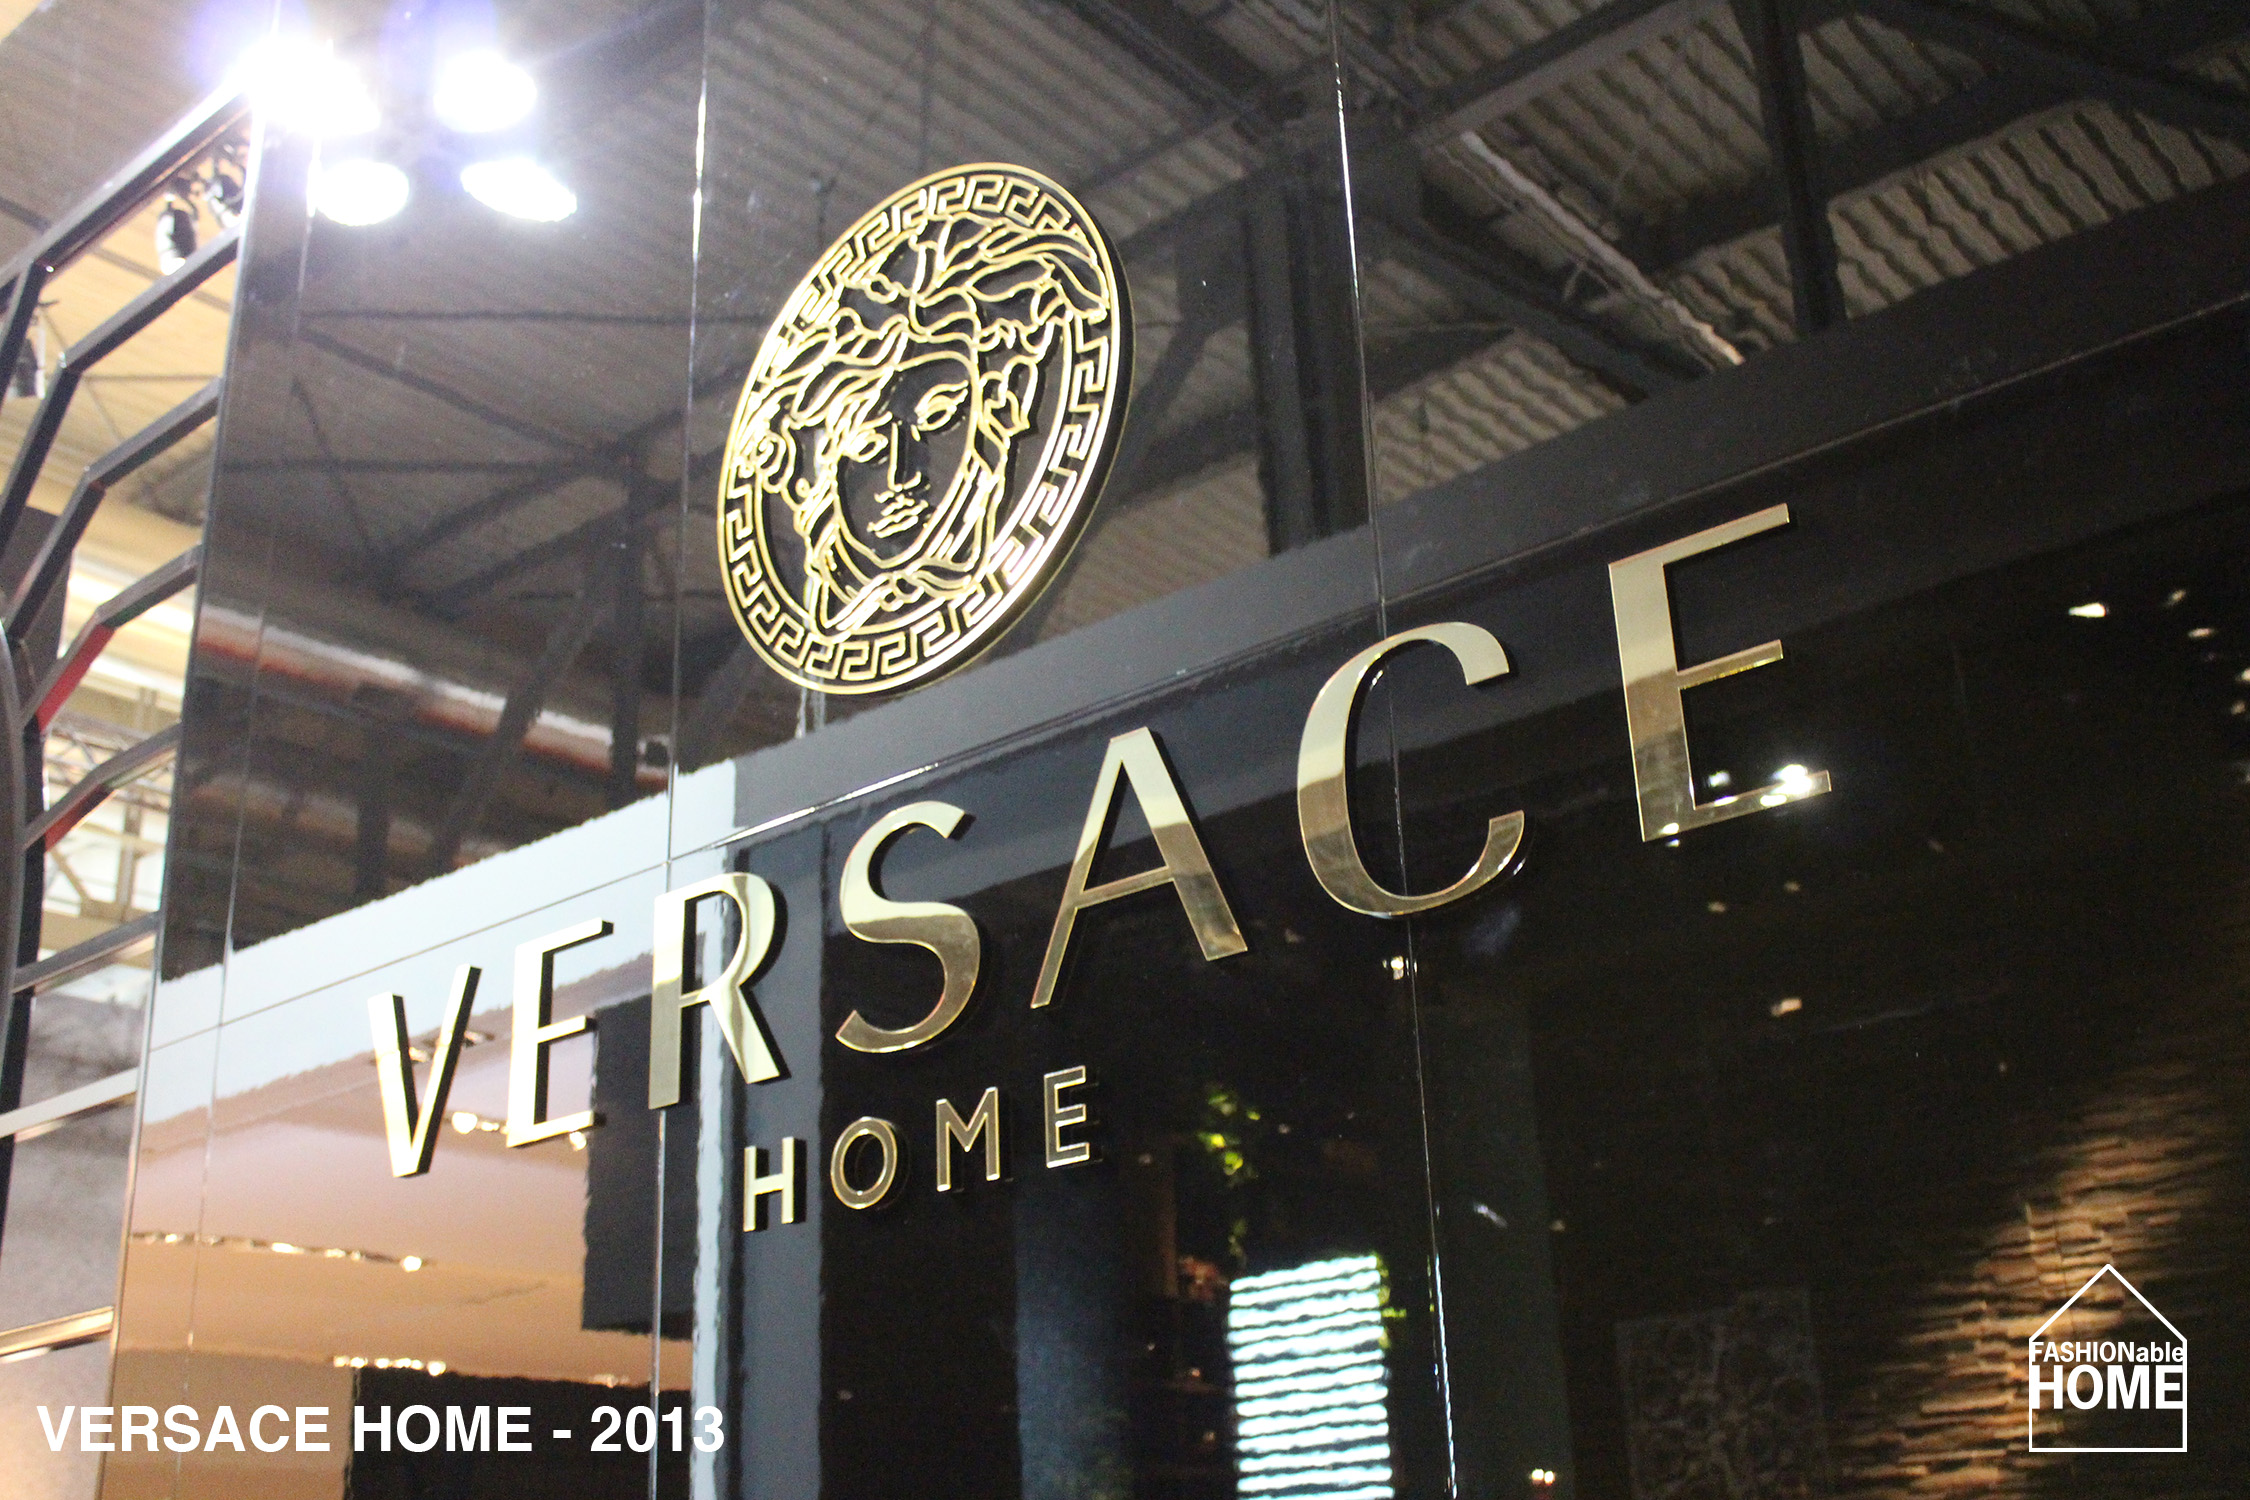 Versace Home Milano 2013 Fashionable Home Blog